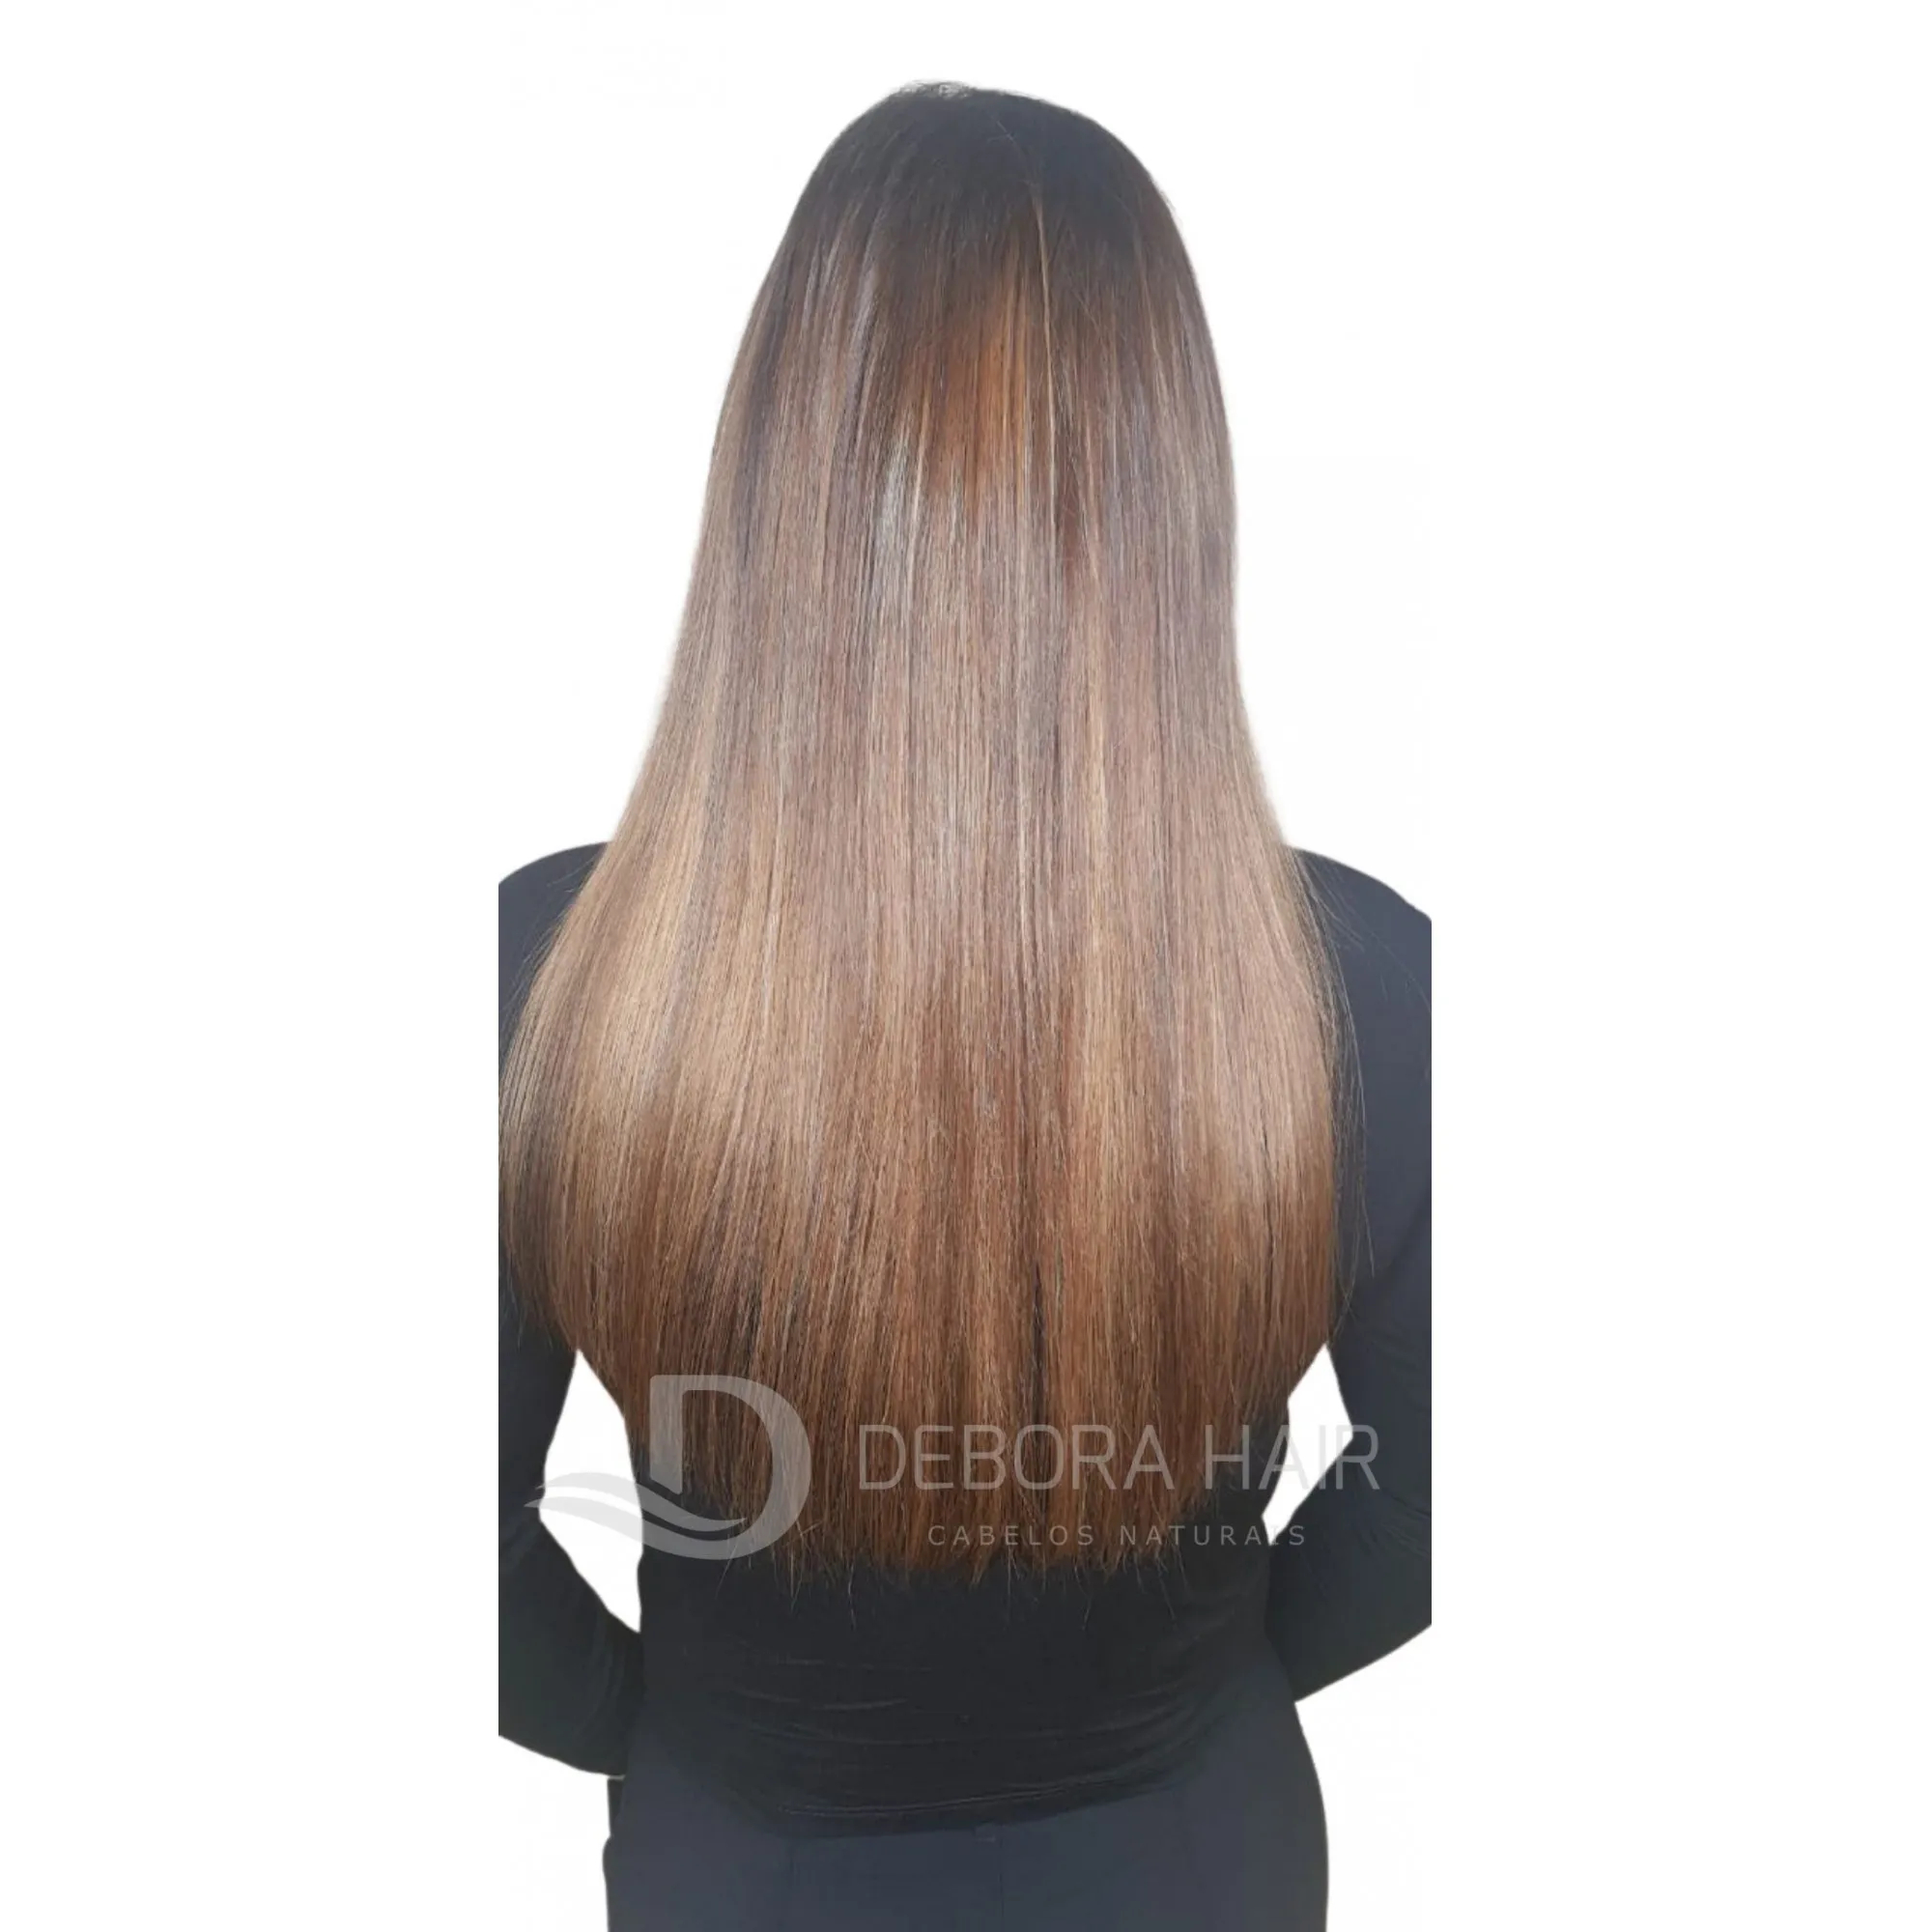 Mega Hair Fita Adesiva 55 cm (SN) N. 1304 20 Peças  - DEBORA HAIR